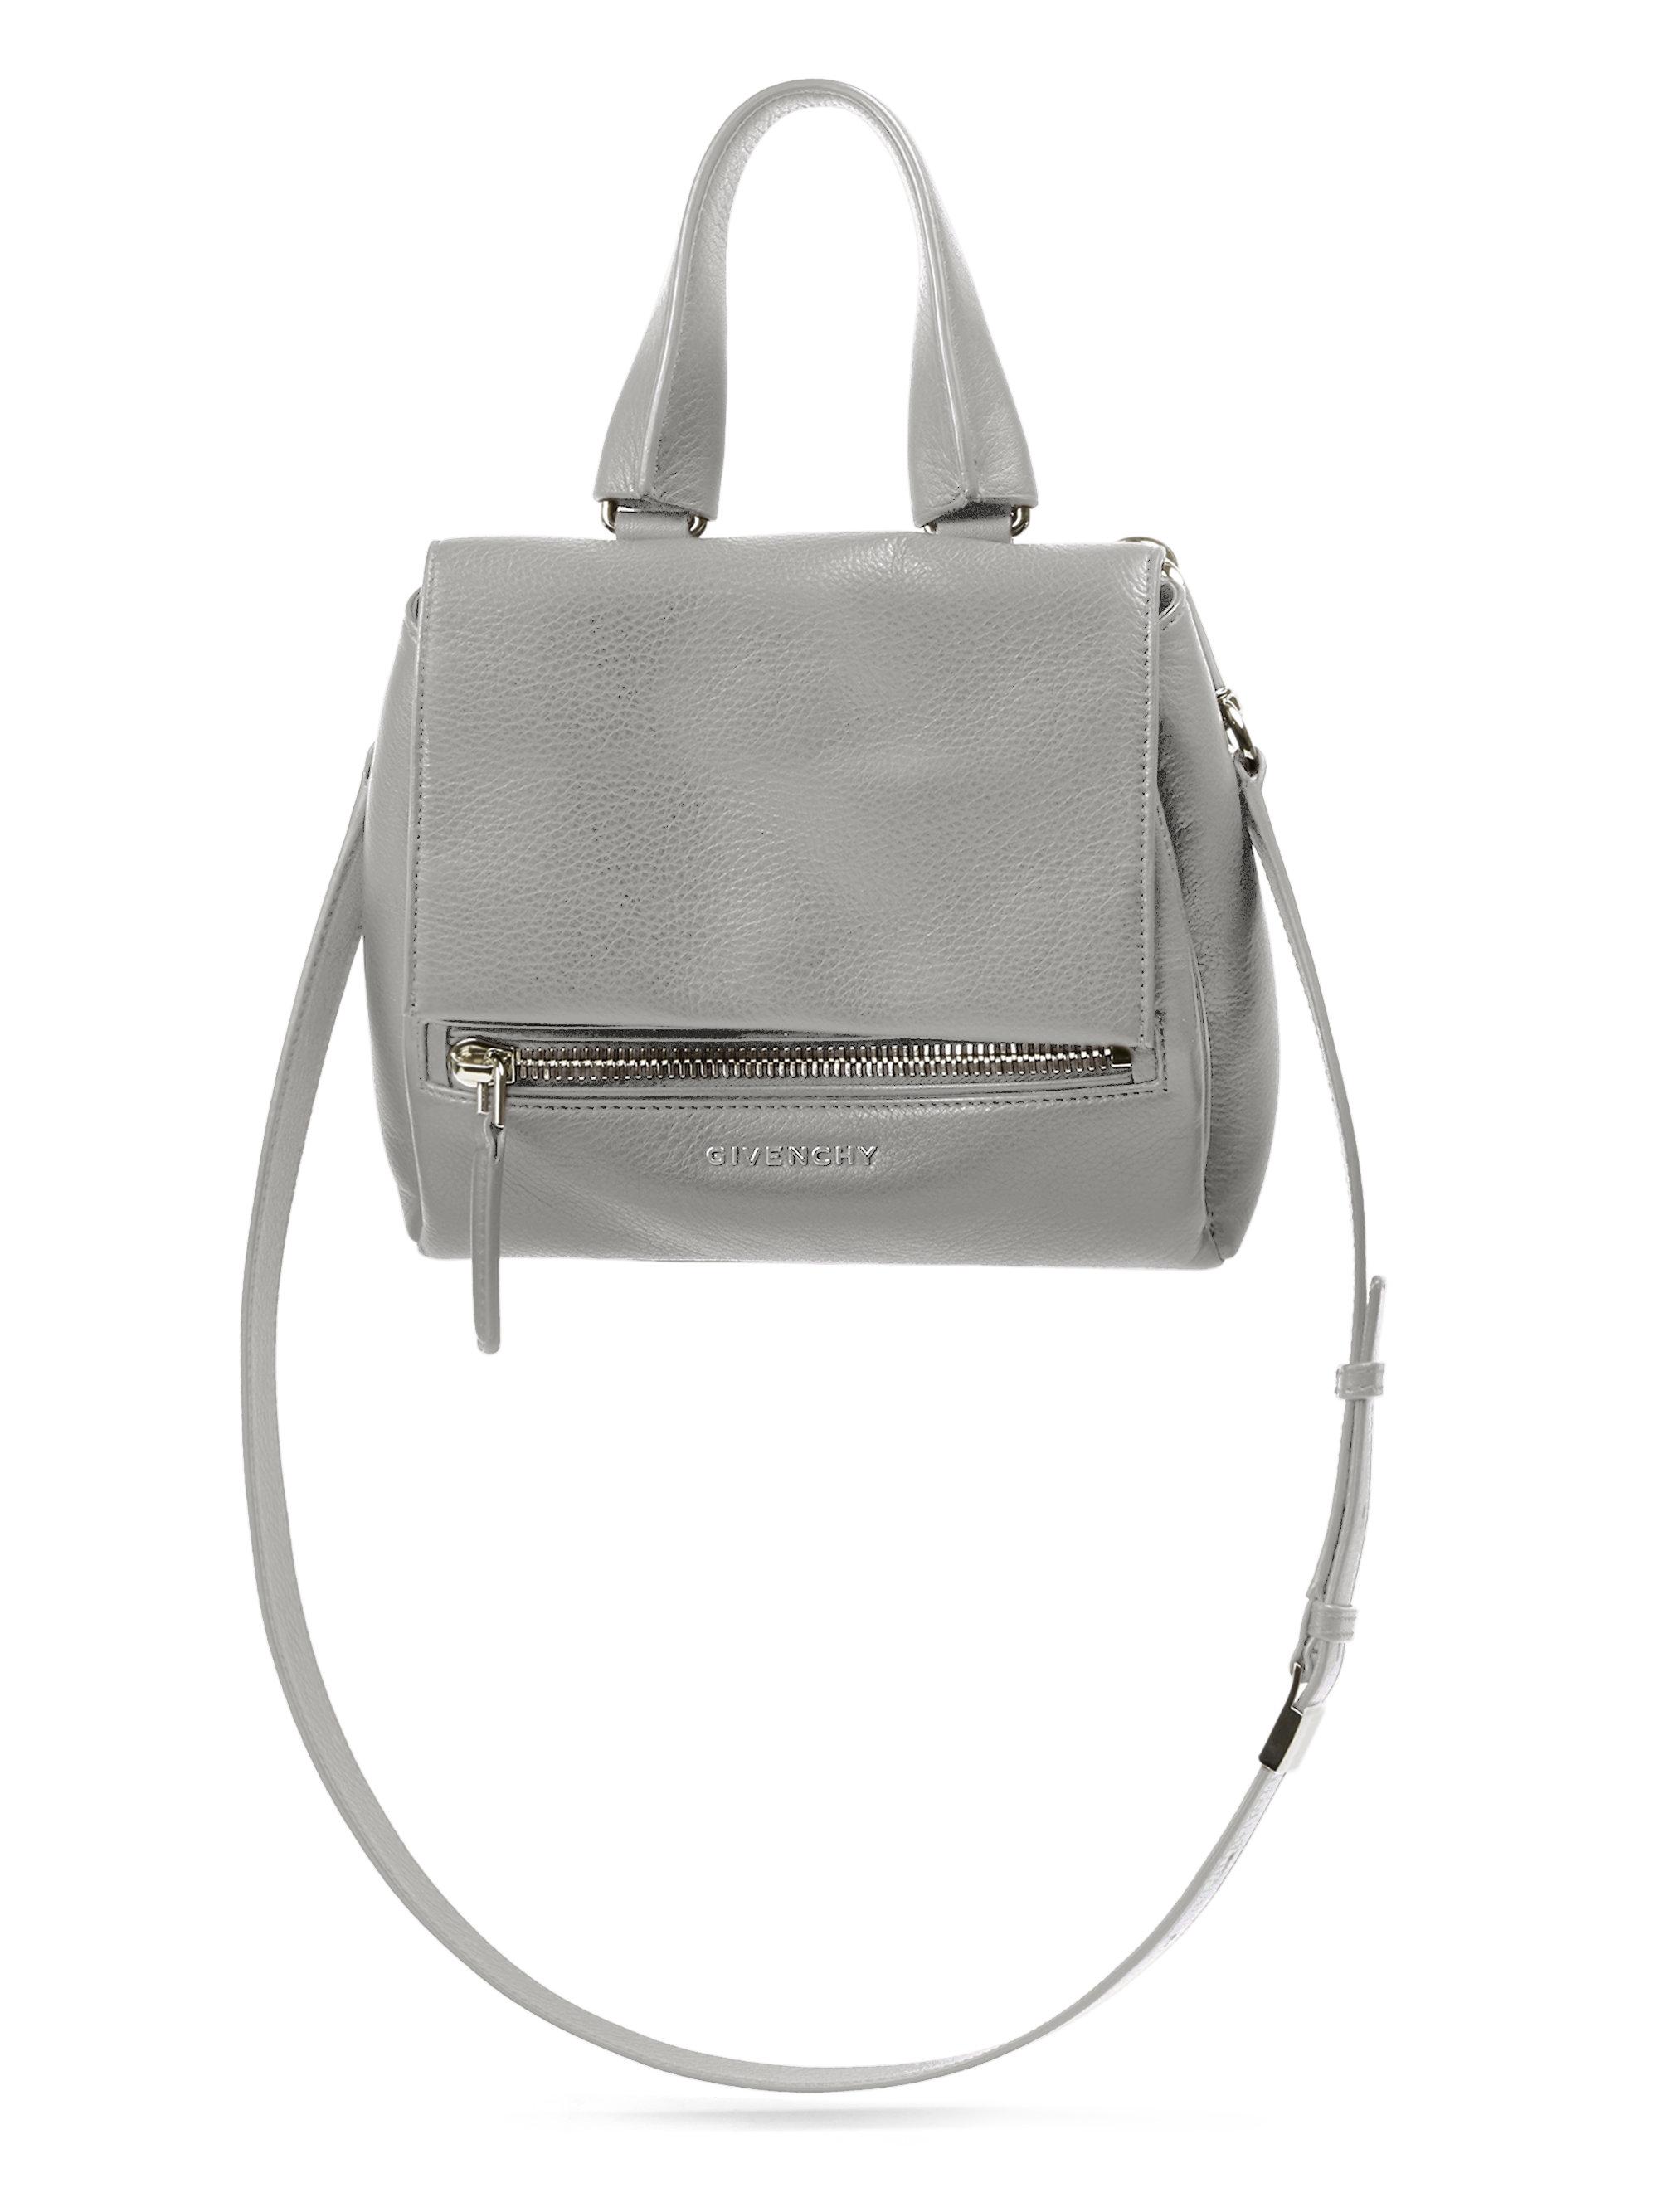 0f022f4c7ef ... Lyst - Givenchy Pandora Pure Mini Shoulder Bag in Gray new york 88838  2580f